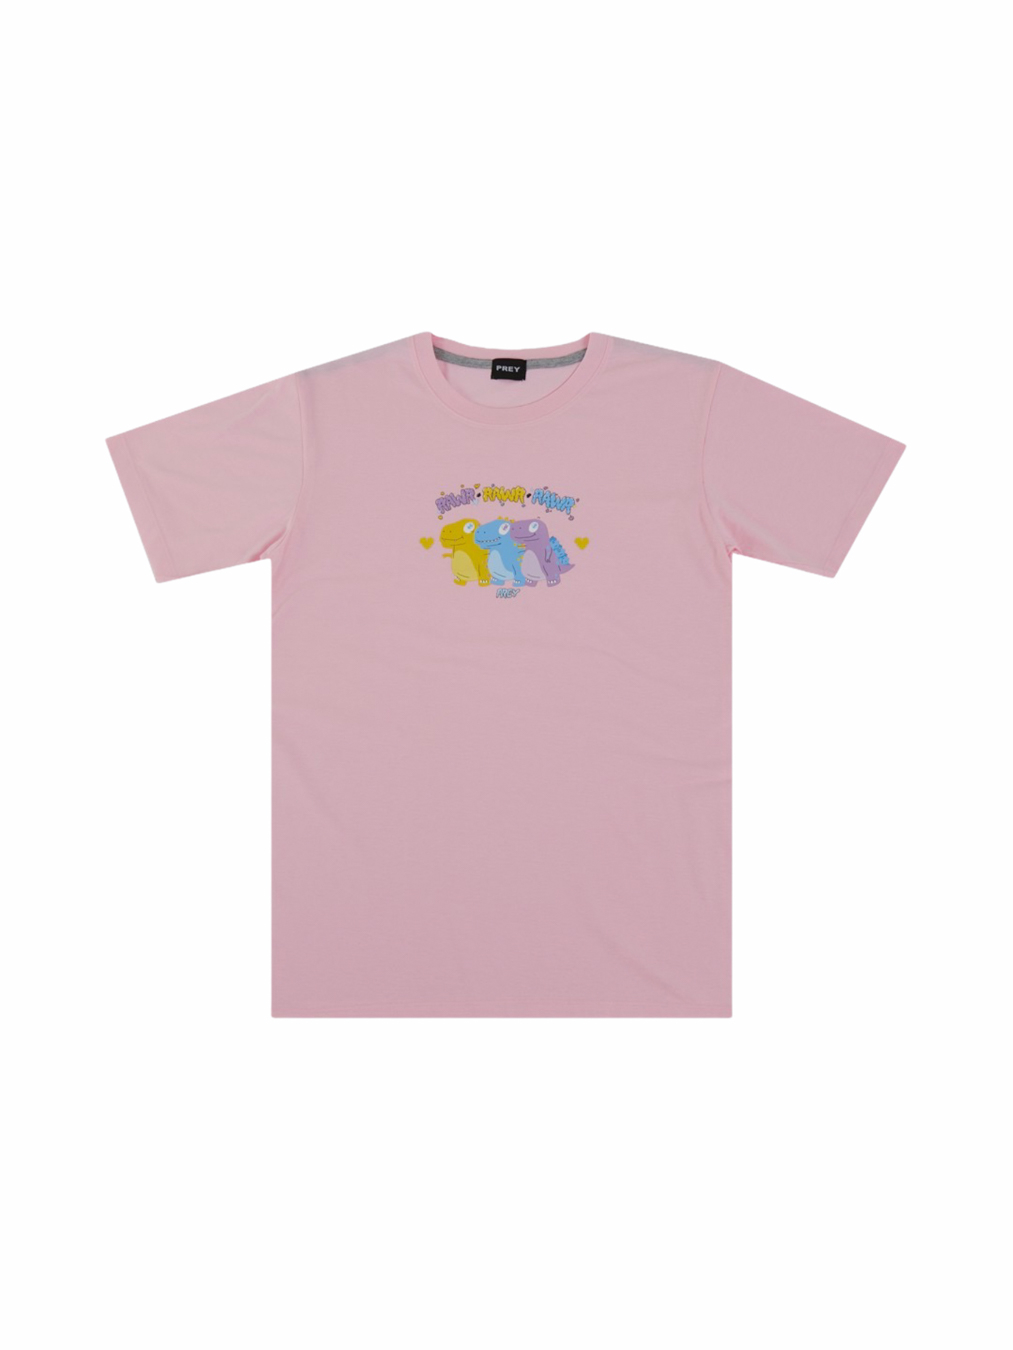 Prey Dinosaur (Soft Pink)